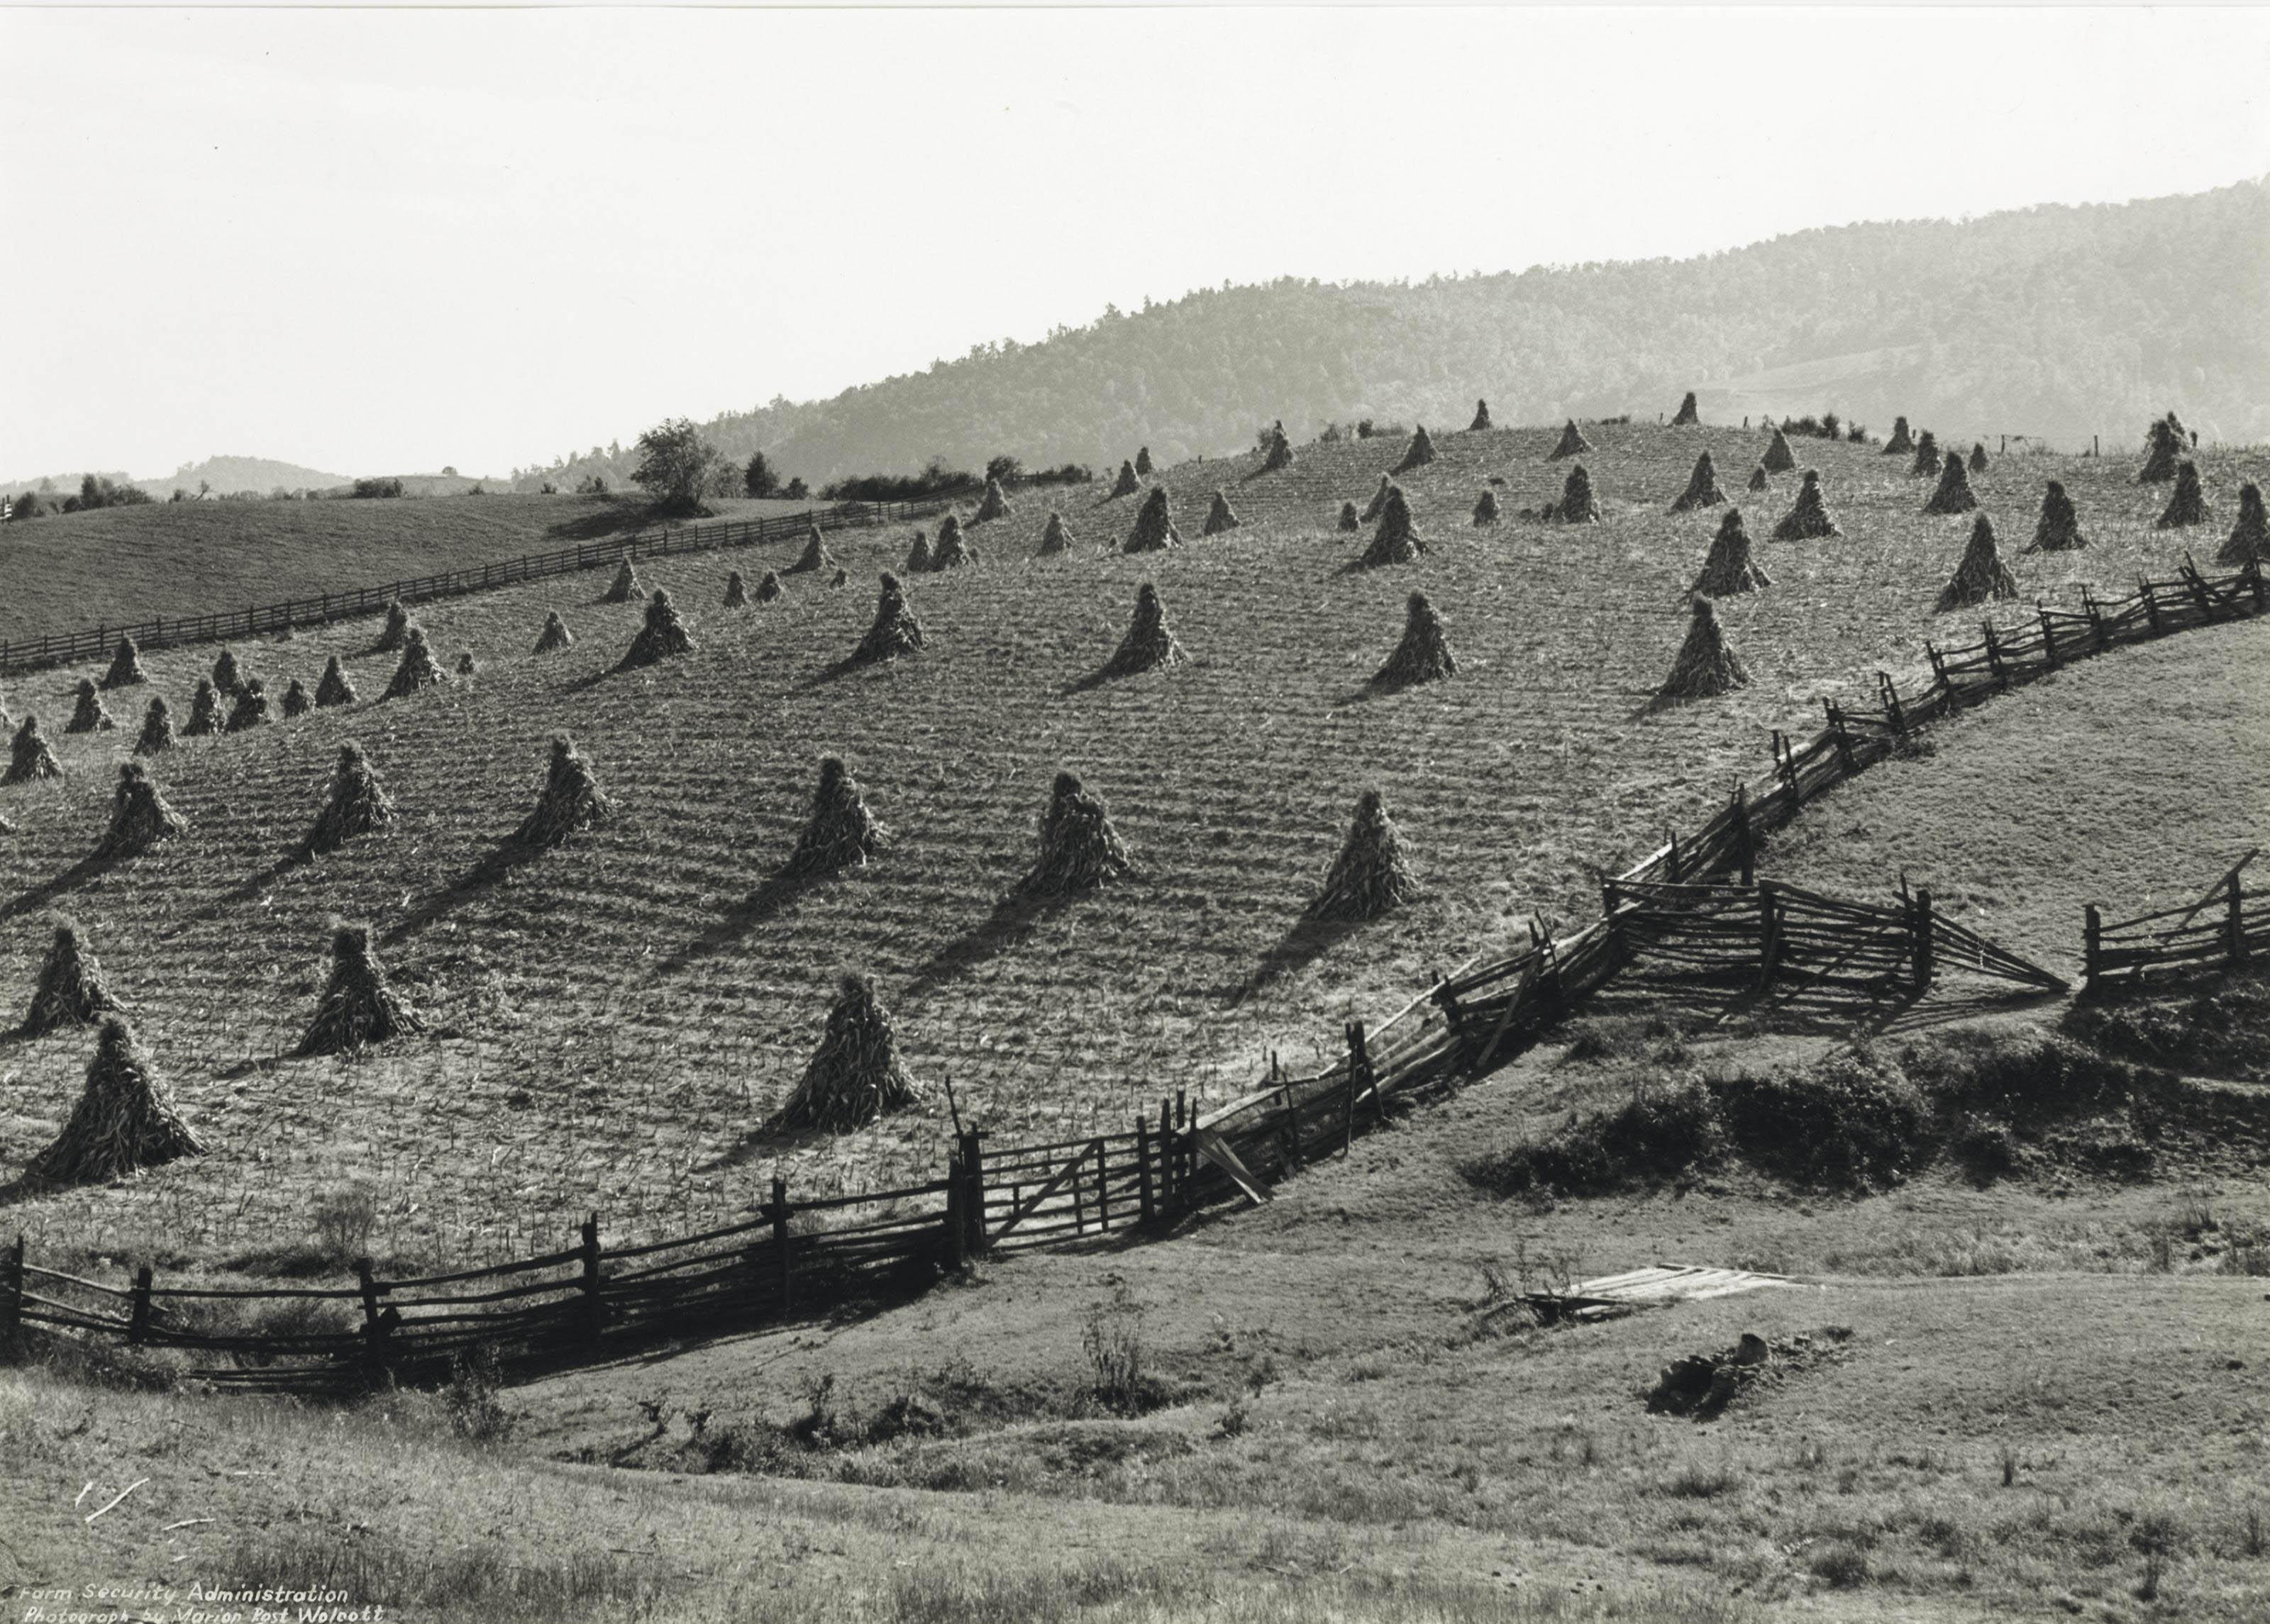 Split Rail Fences and Corn Shocks, near Marion, W. Va., 1939